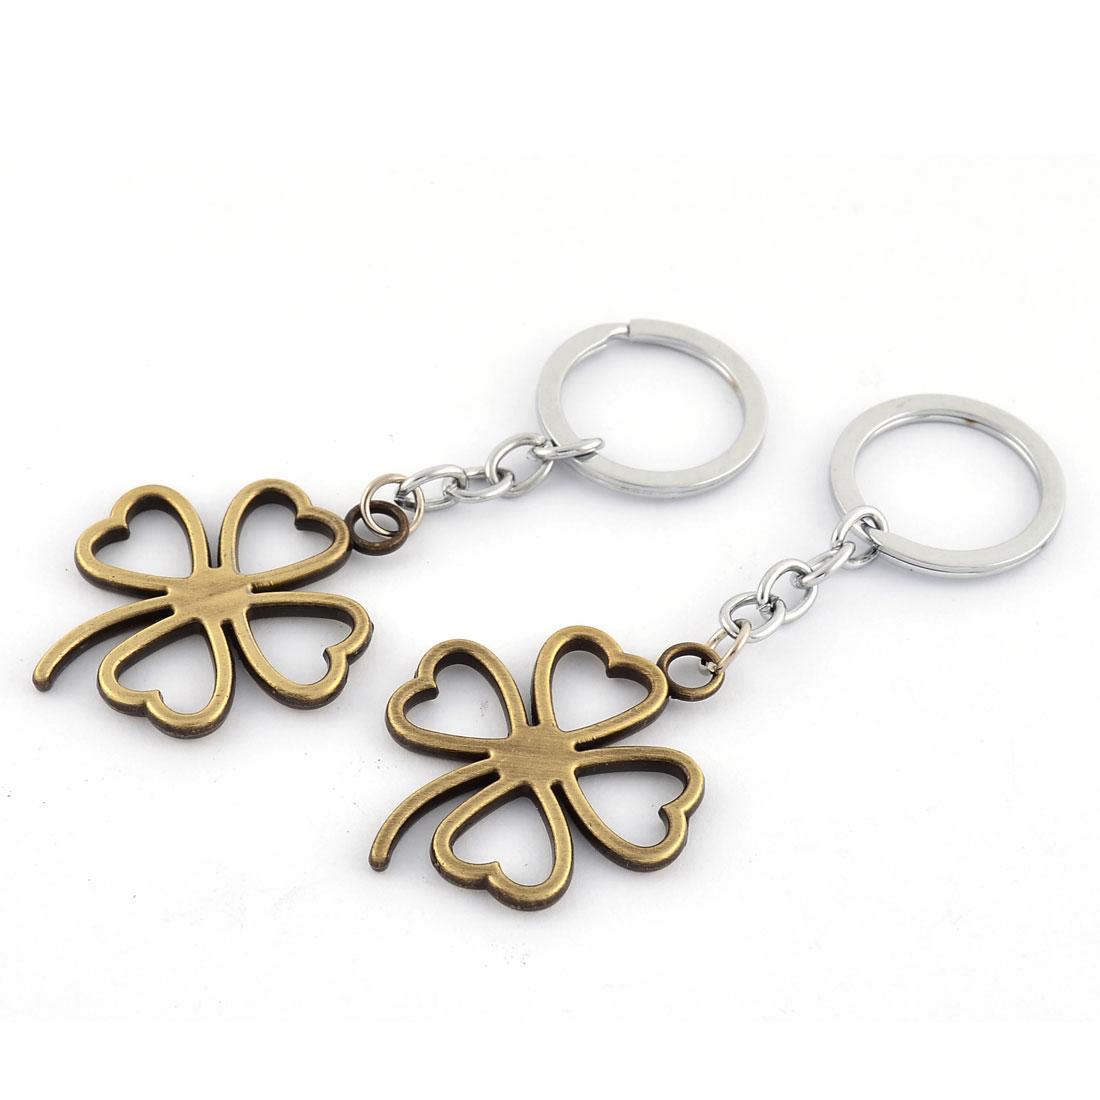 Metal Lucky Grass Shaped Pendant Ornament Key Chain Golden Tone 10.2cm 2 Pcs